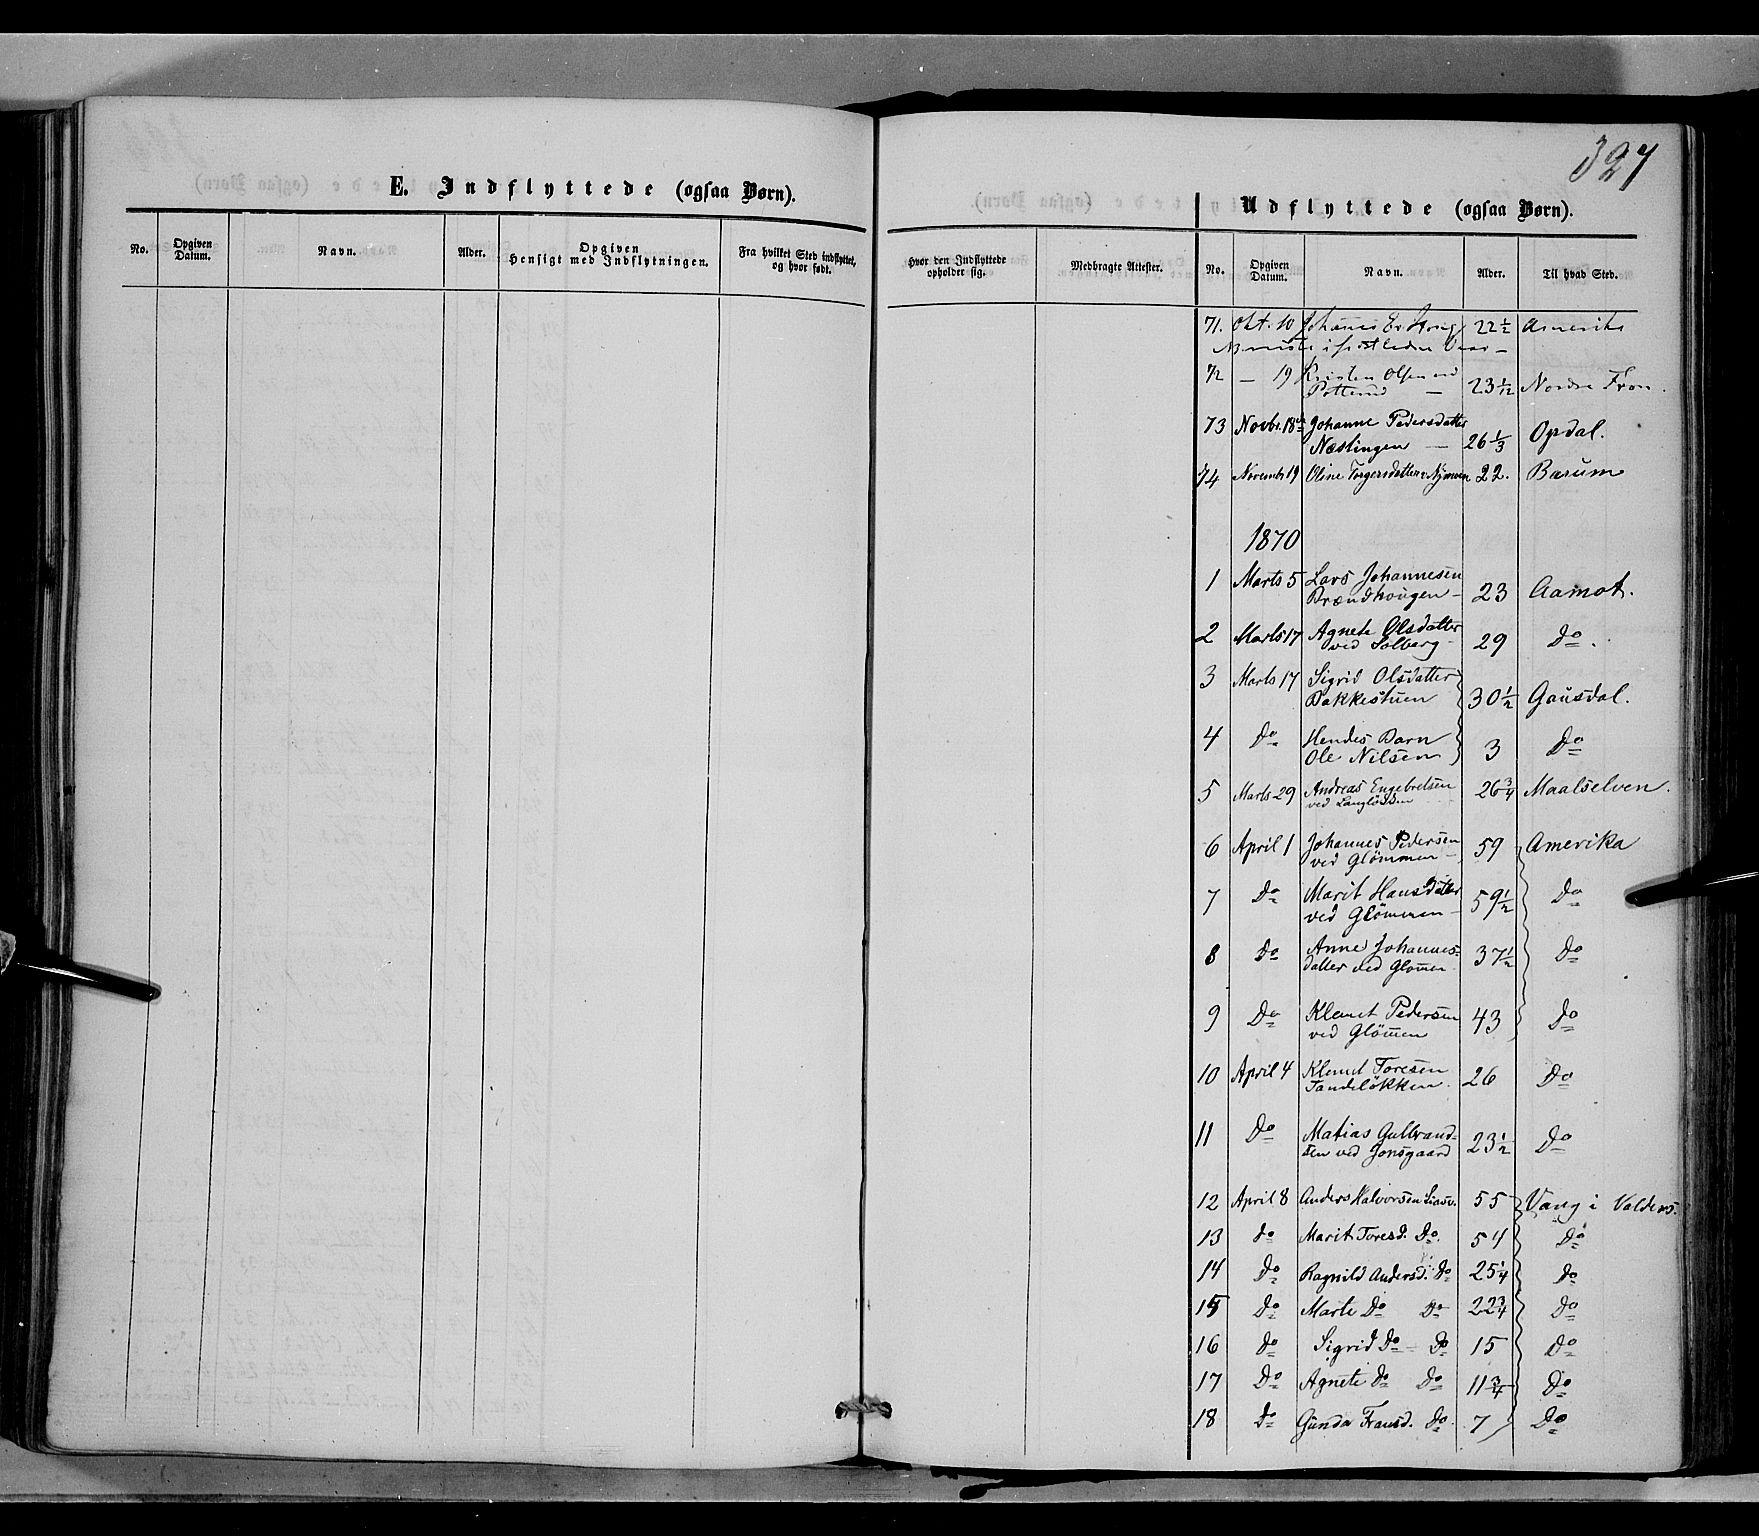 SAH, Øyer prestekontor, Ministerialbok nr. 6, 1858-1874, s. 327